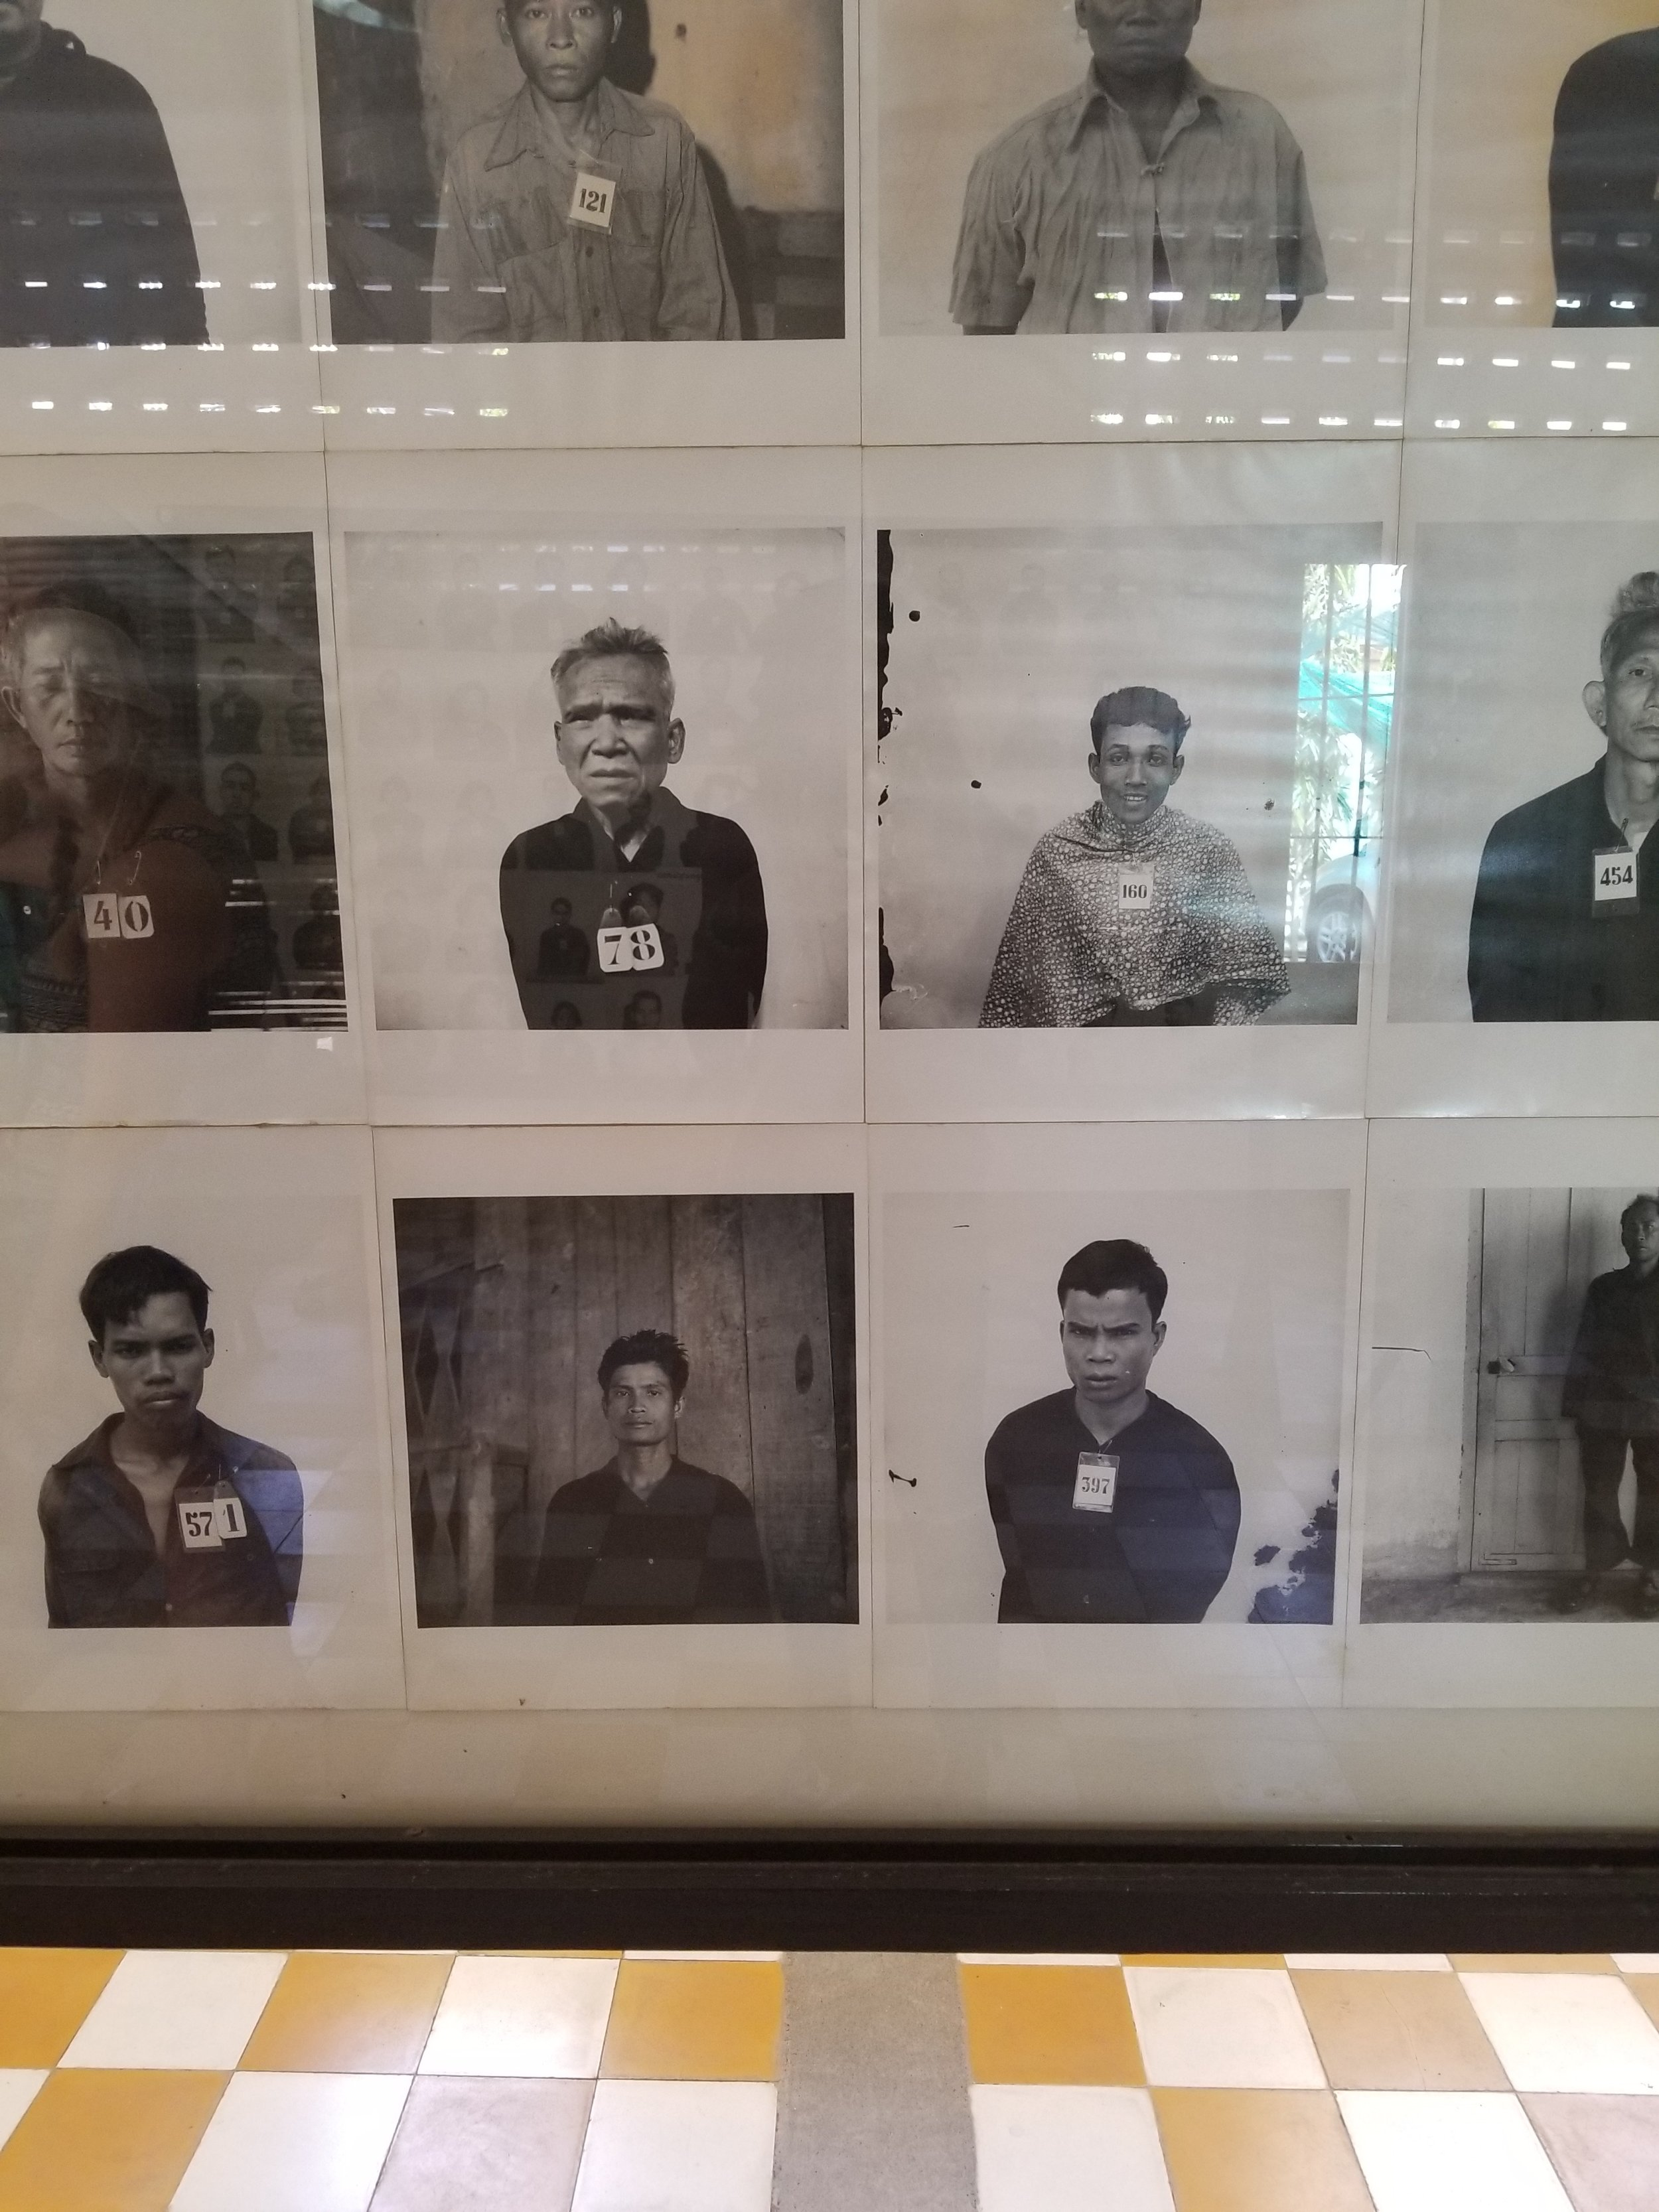 Wall of S-21 Intake Photos